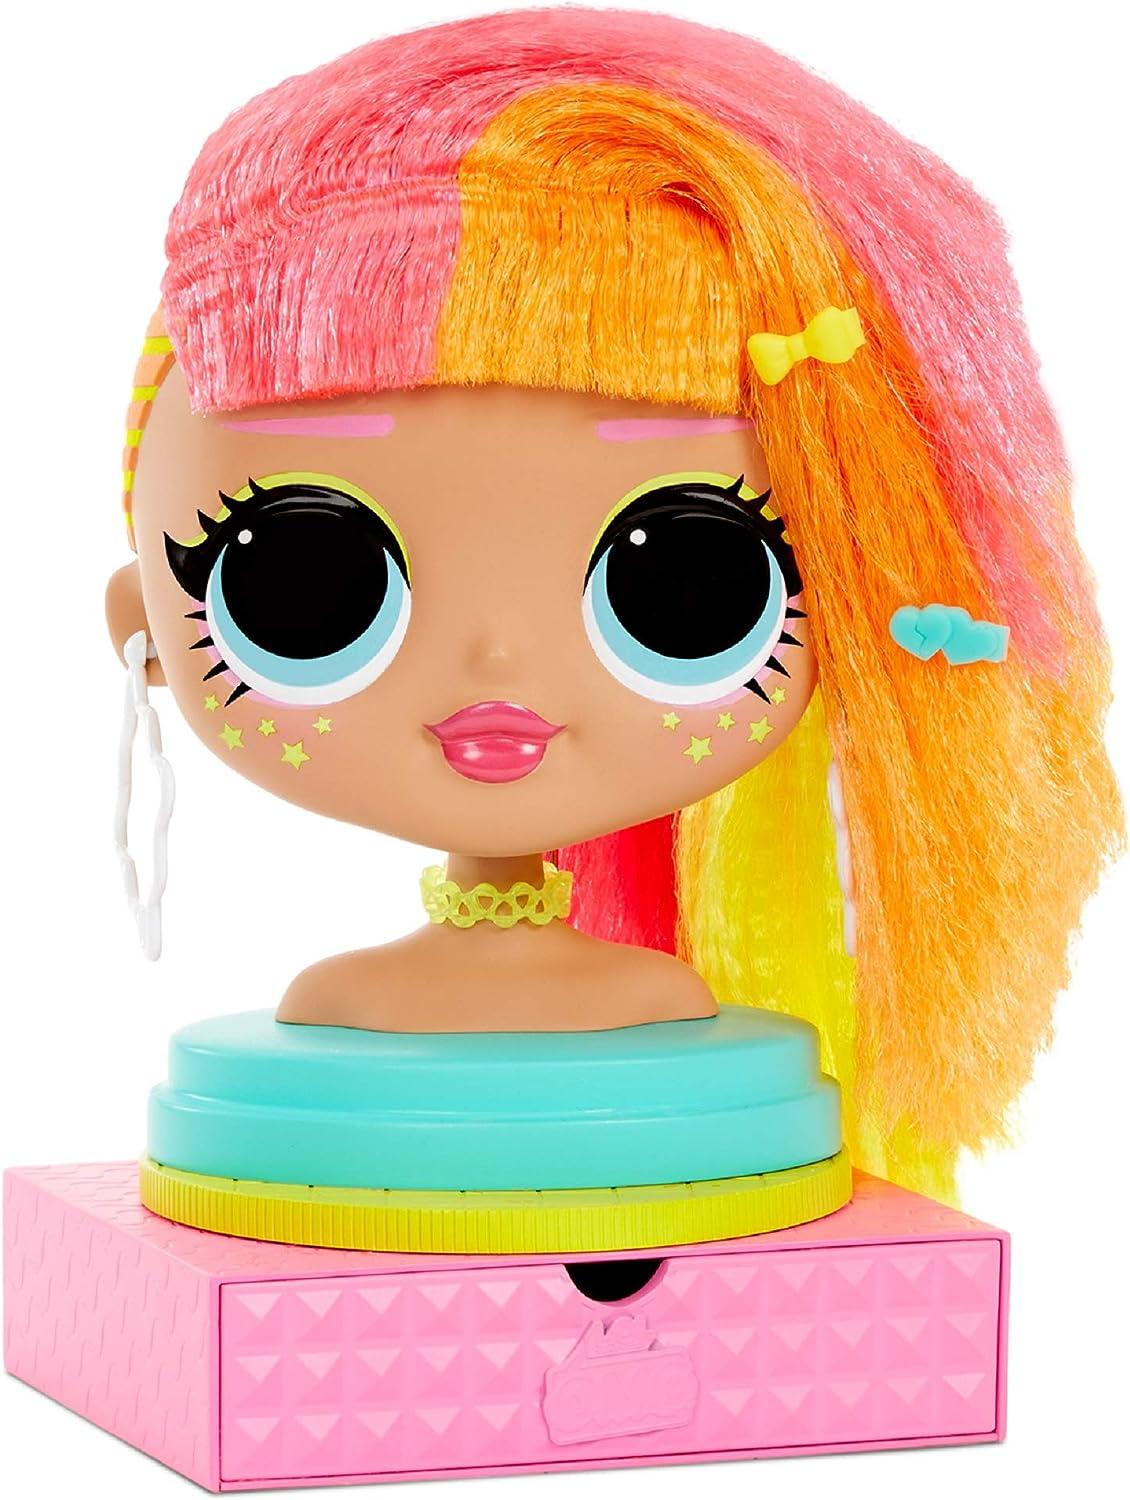 LOL Surprise doll accessories orange wrist sweatbands set of 2